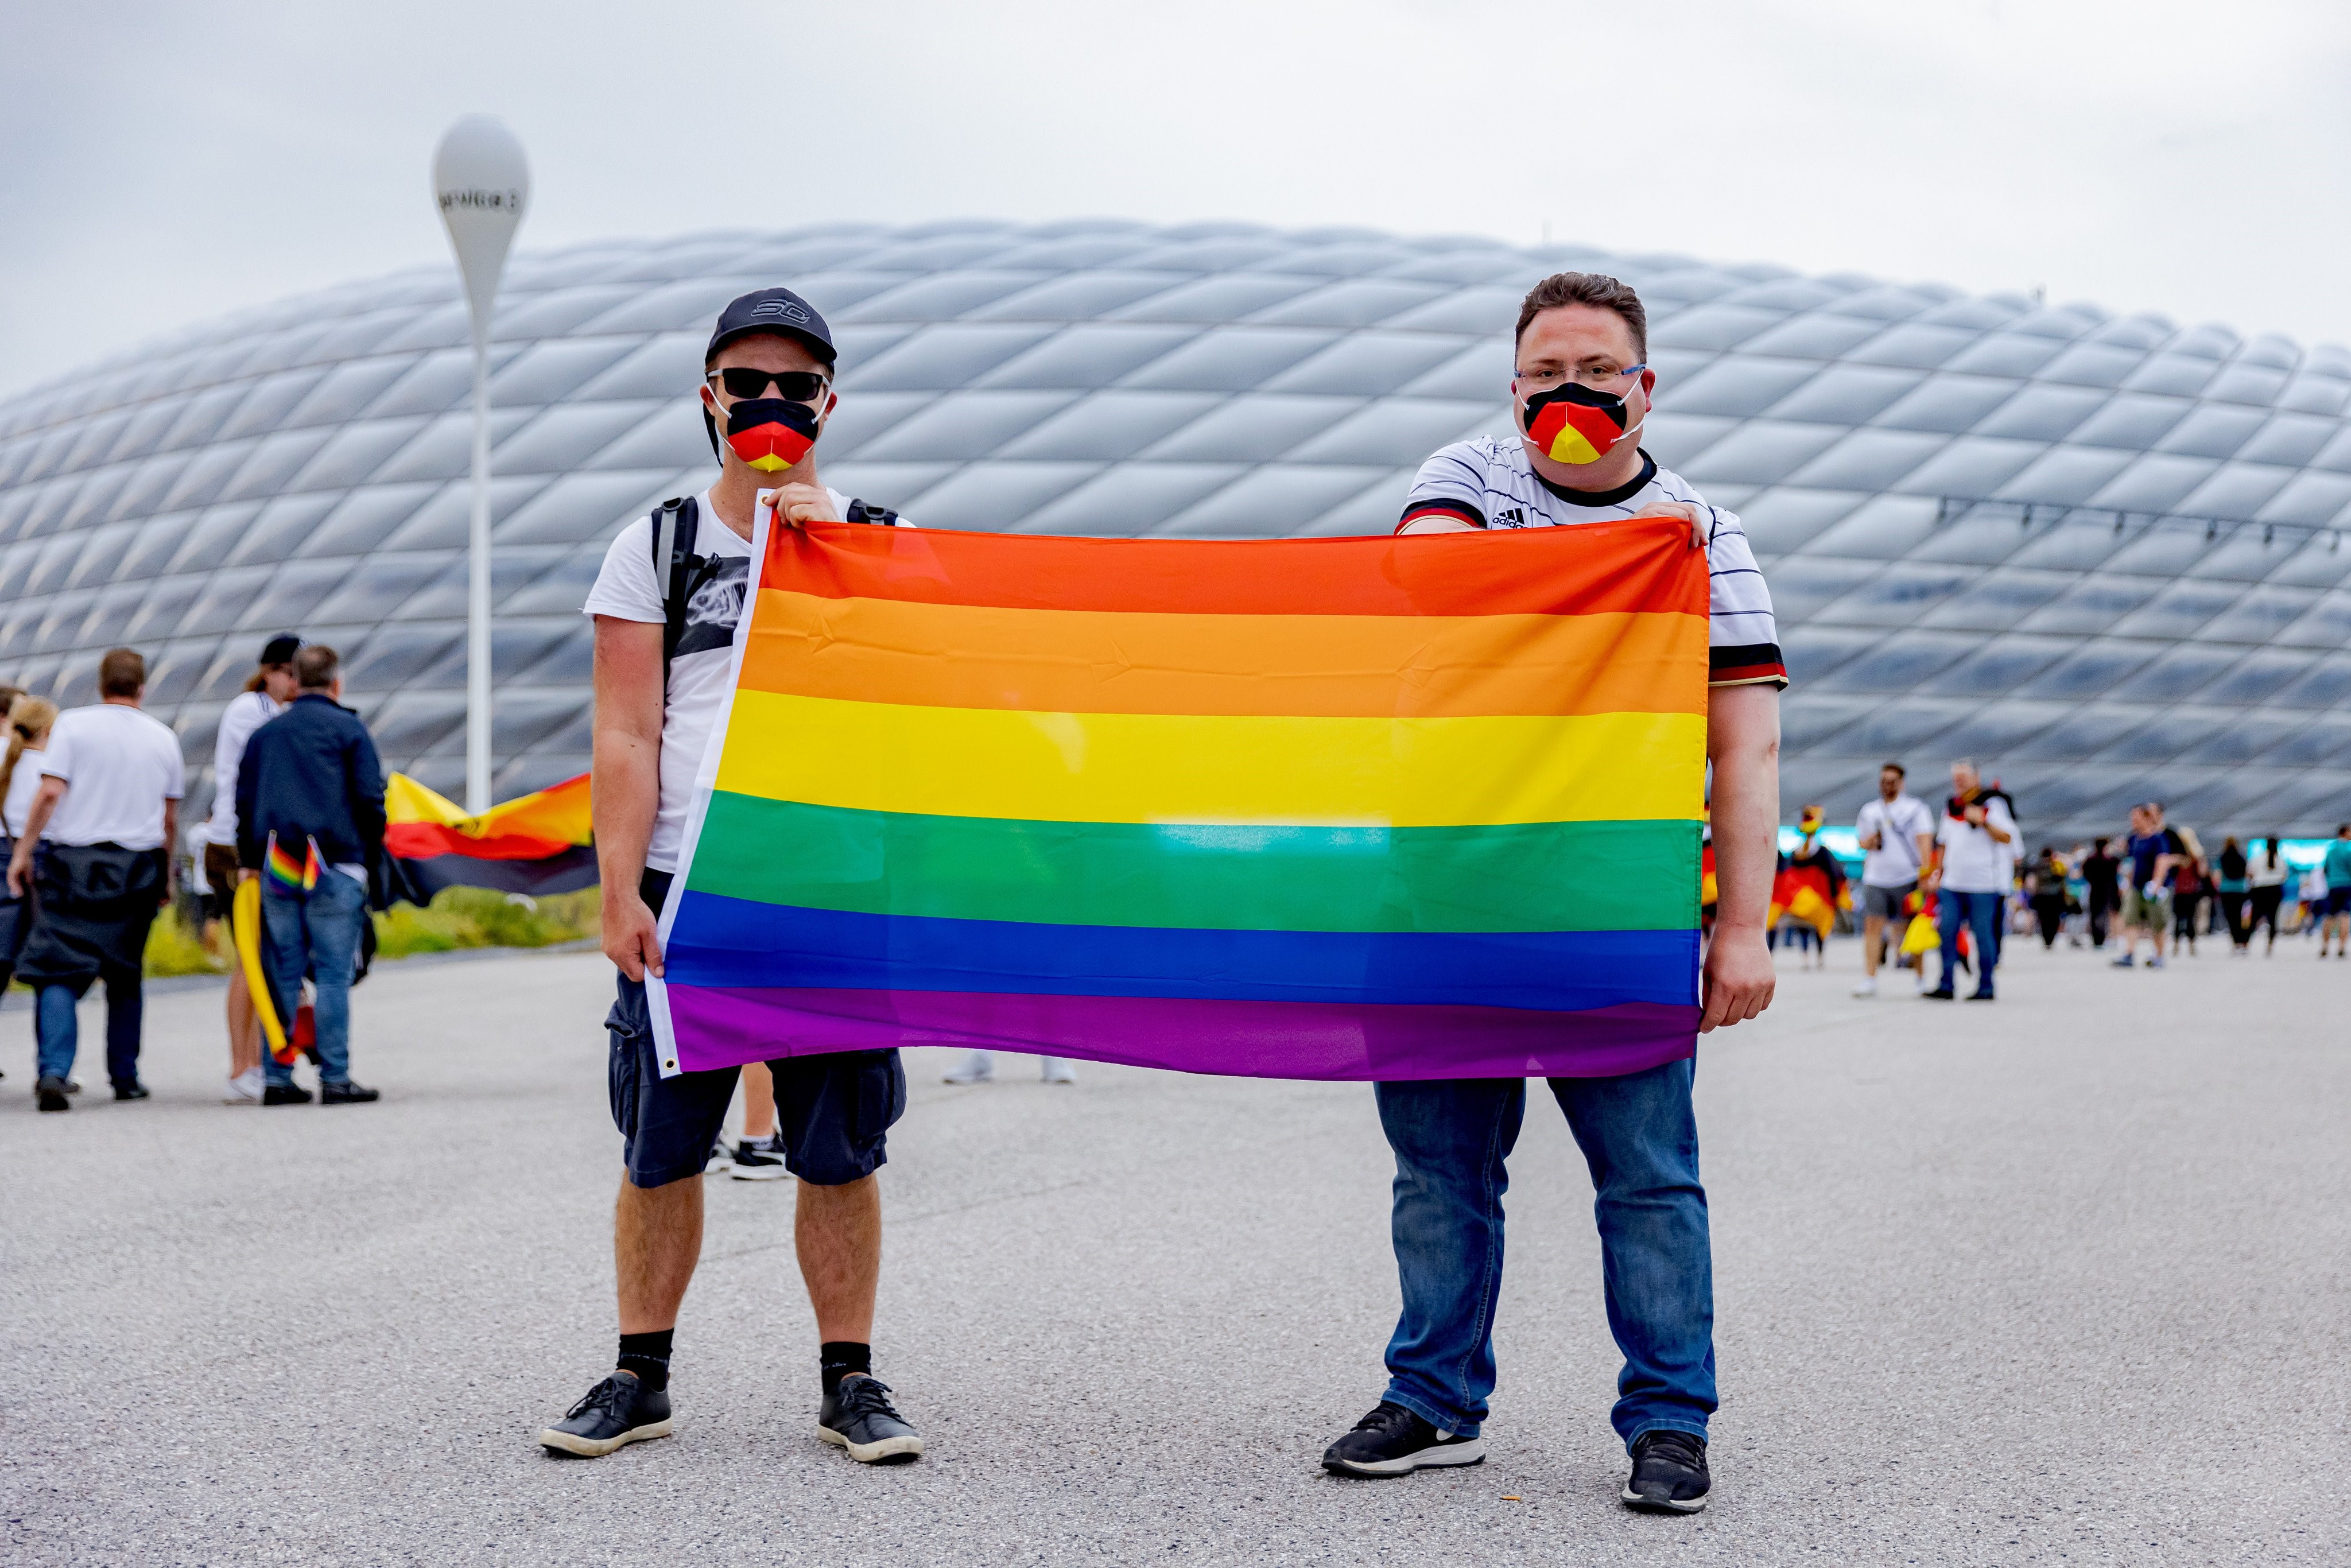 https://i.eurosport.com/2021/06/23/3159642.jpg